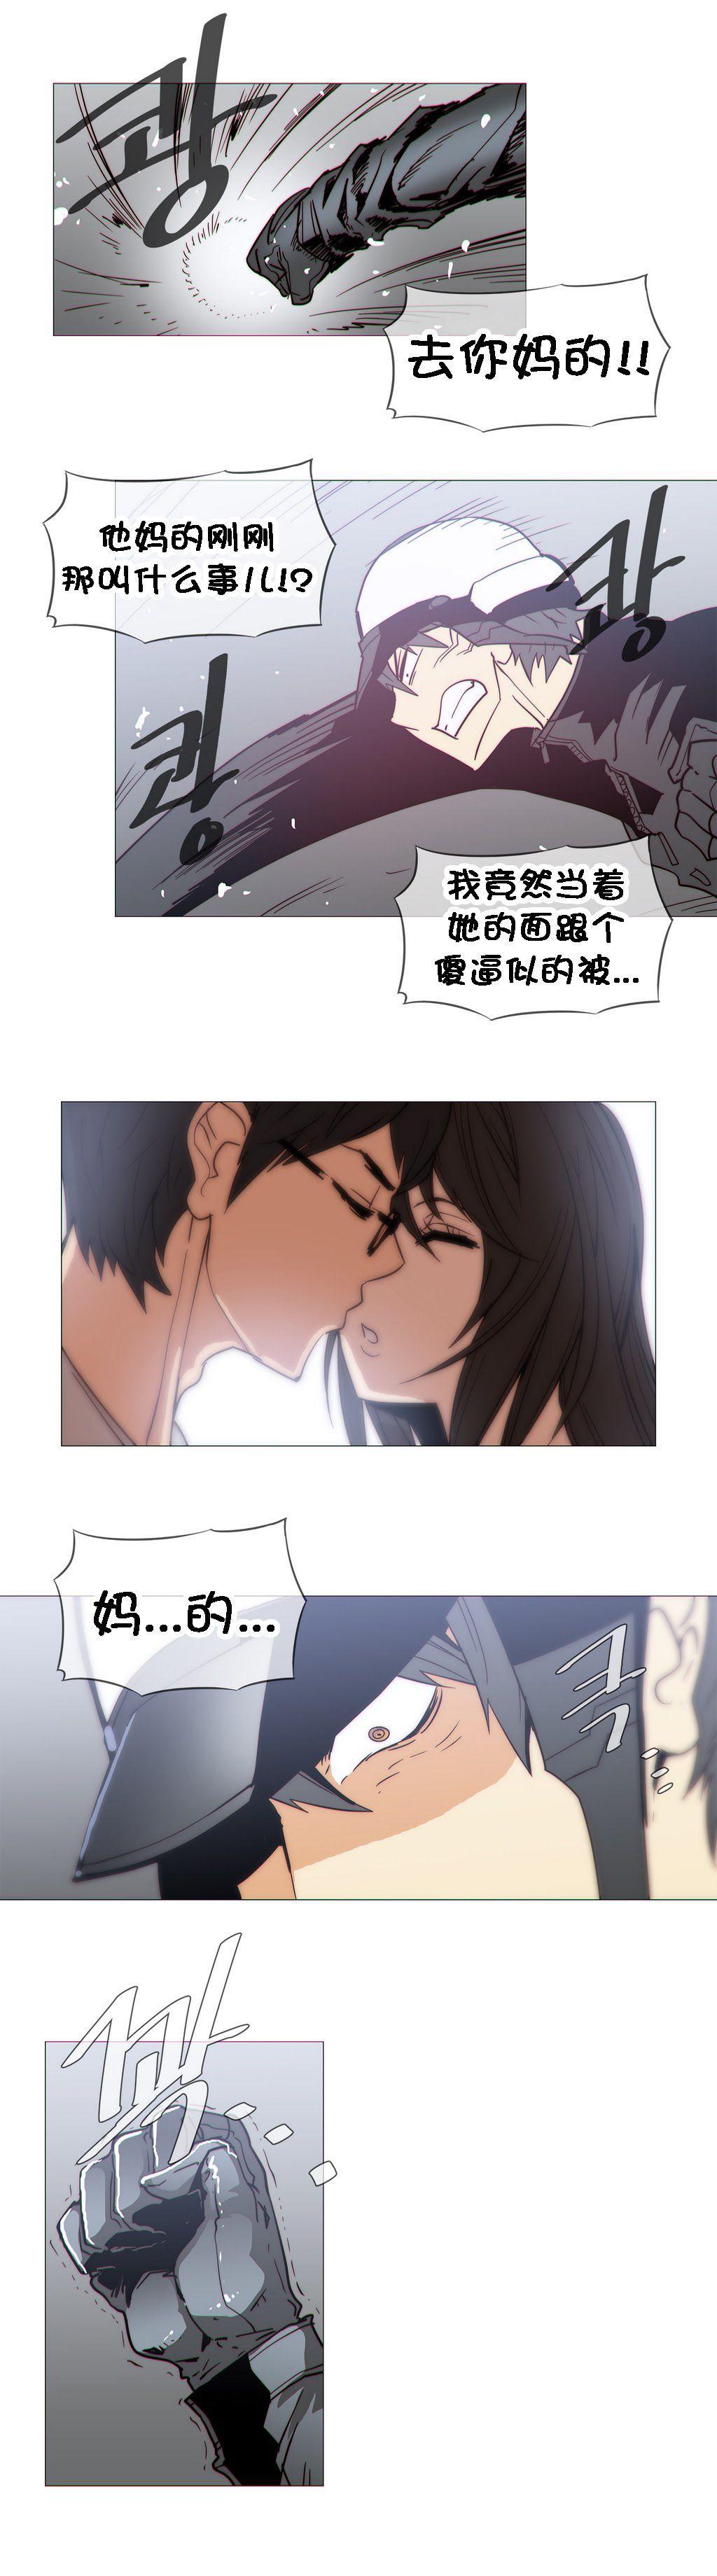 HouseHold Affairs 【卞赤鲤个人汉化】1~33话(持续更新中) 603